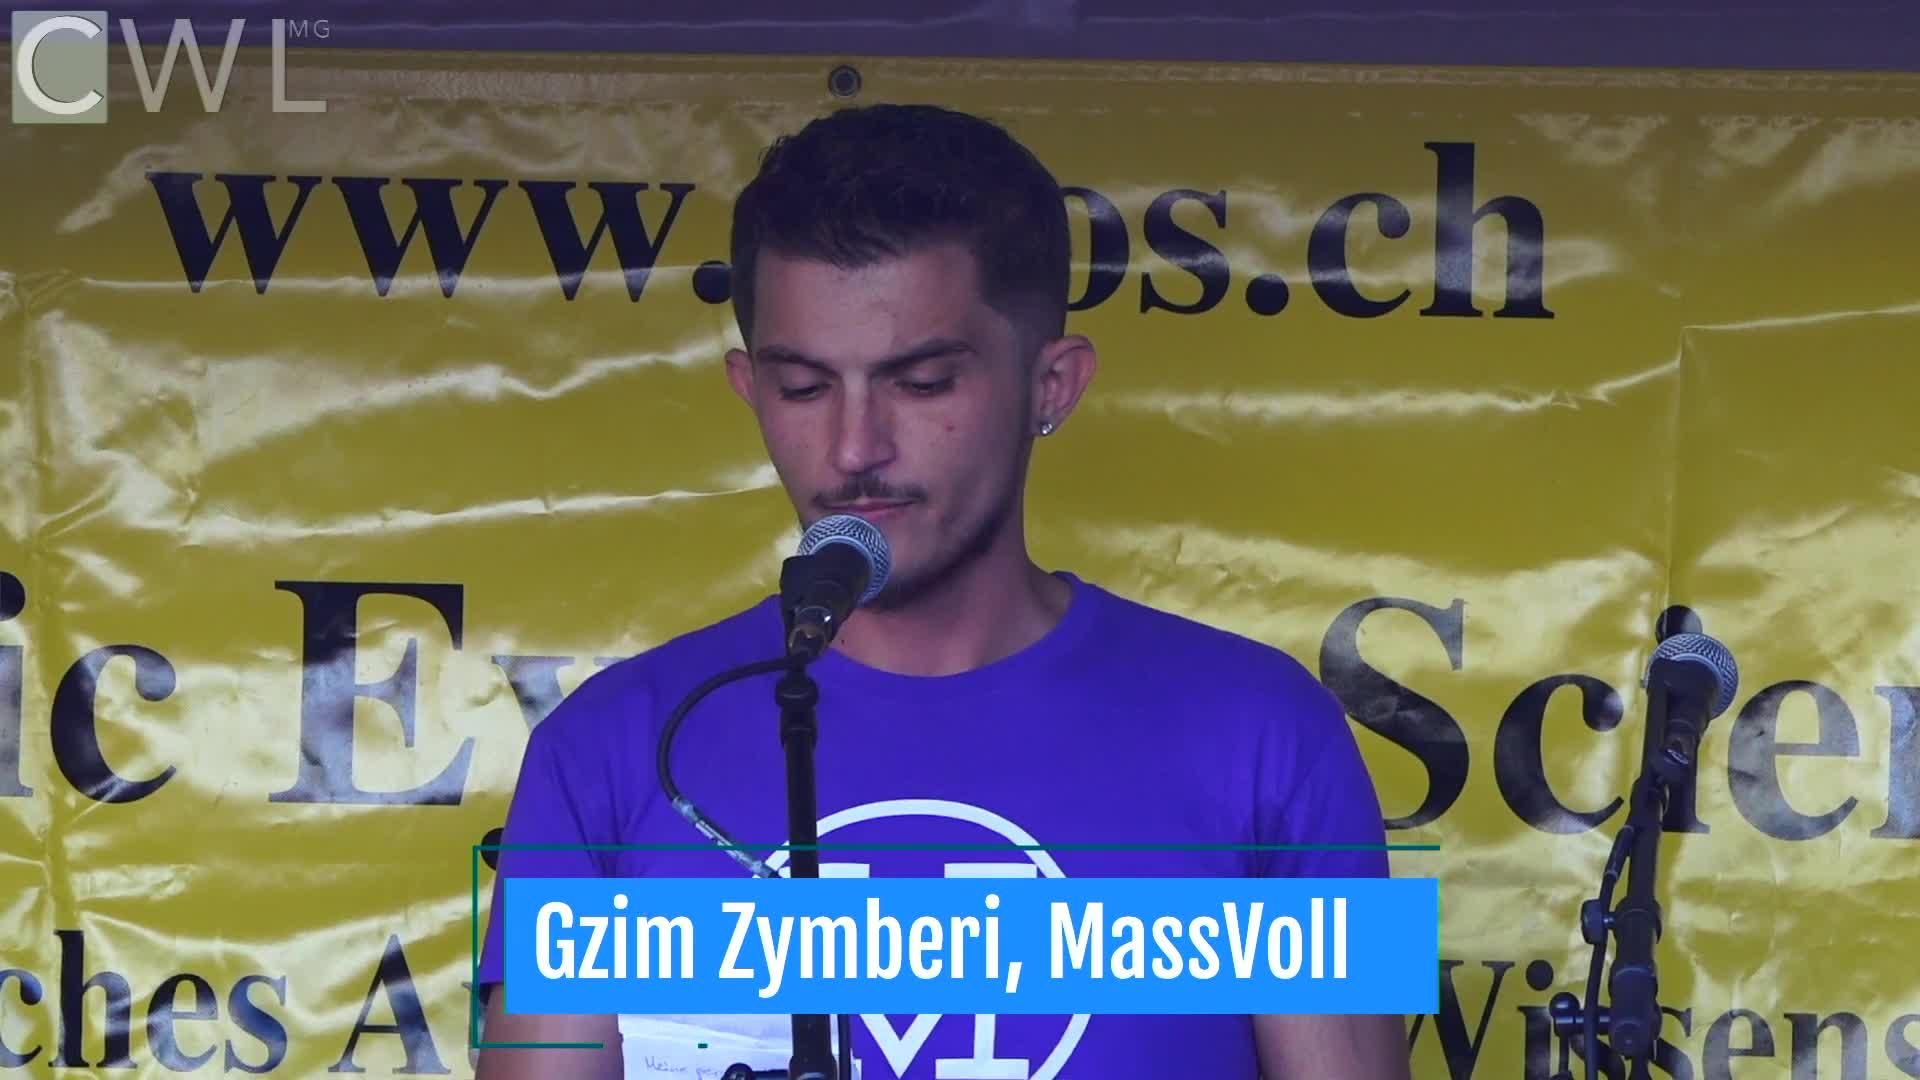 Ansprache: Gzim Zymberi : MassVoll